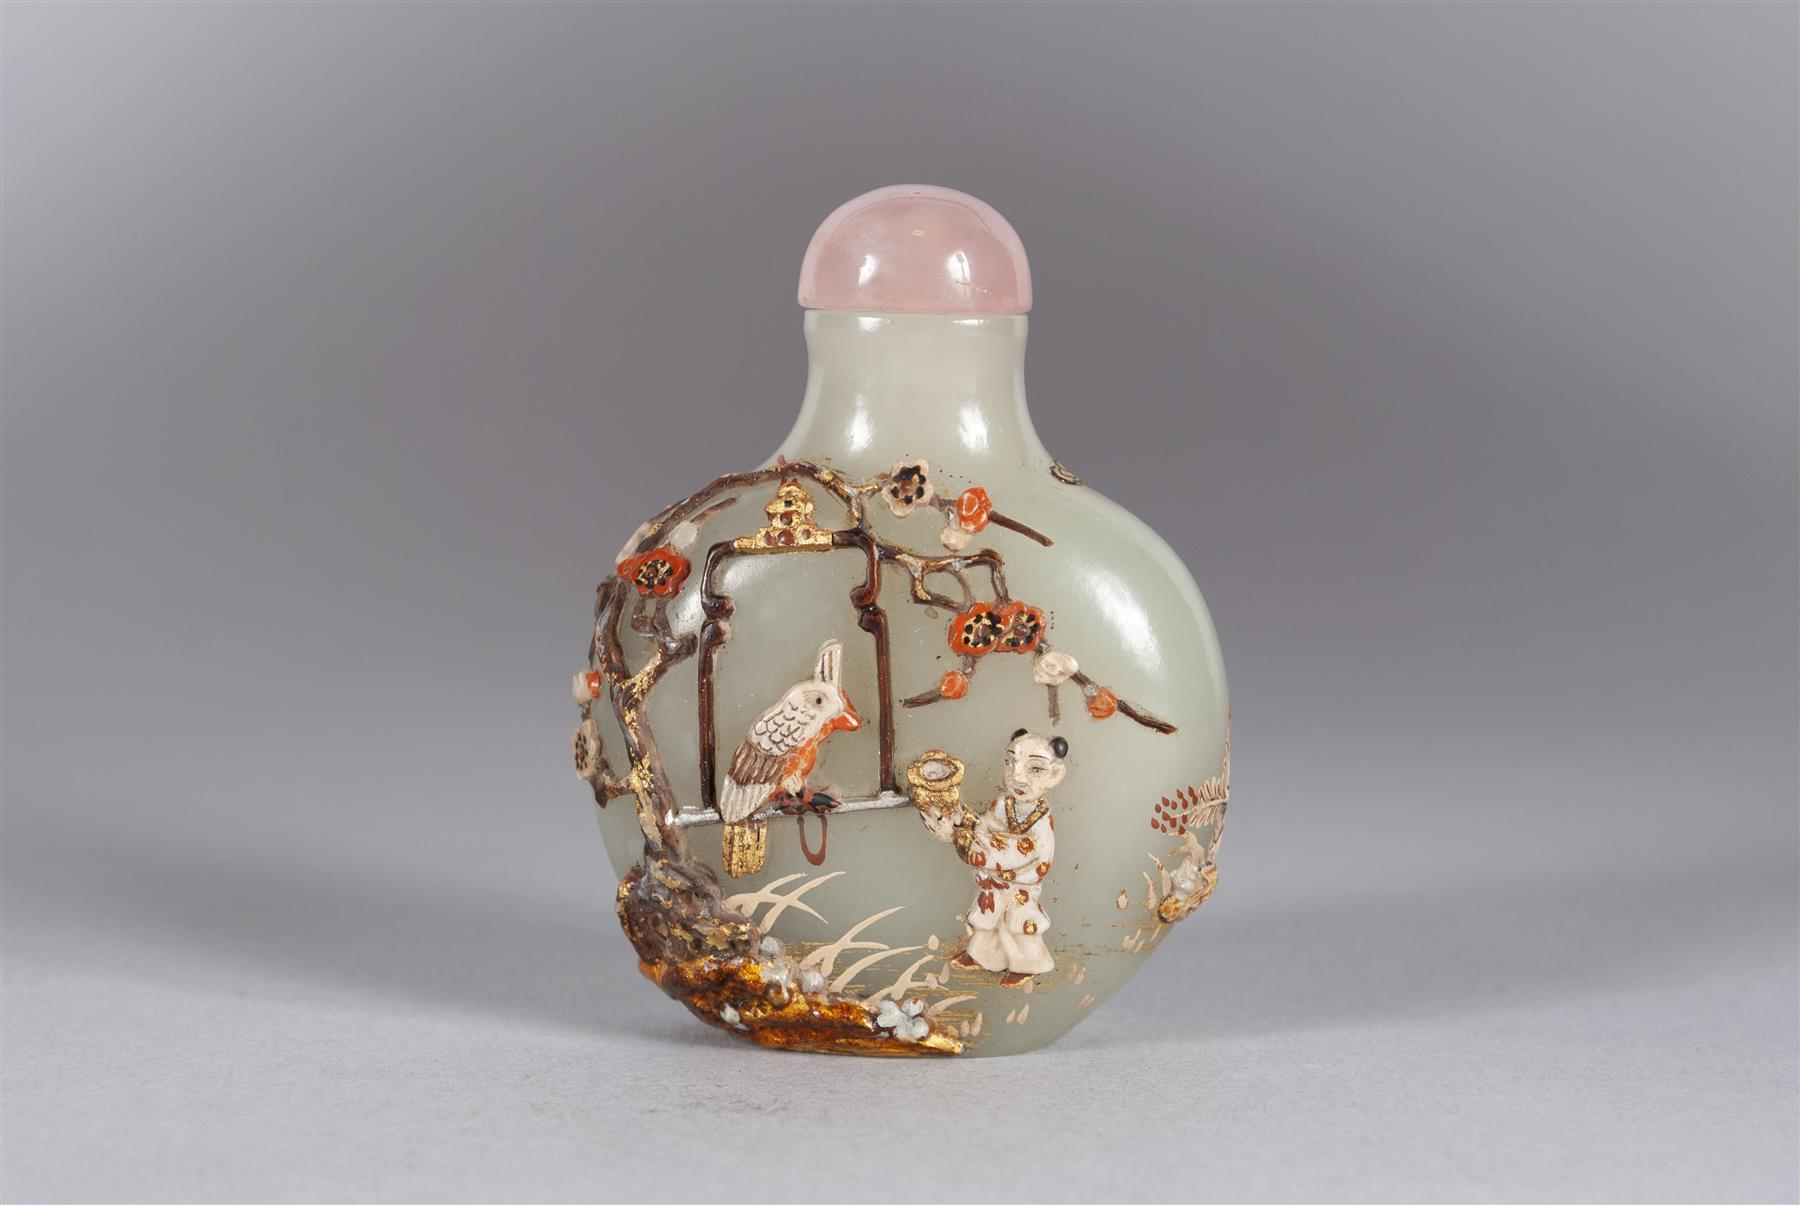 A RARE JAPANESE EMBELLISHED CHINESE JADE SNUFF BOTTLE